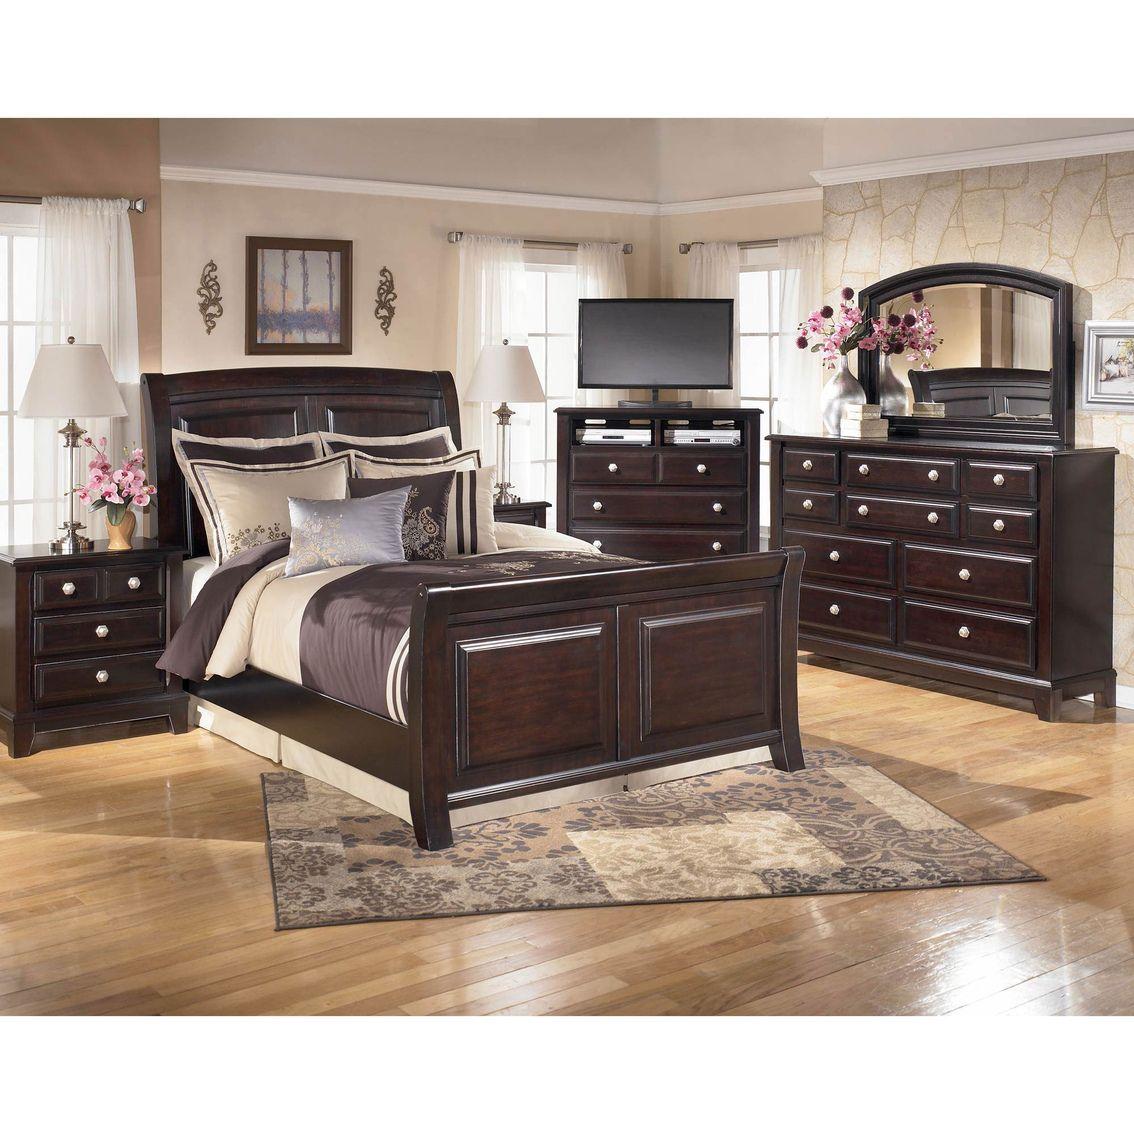 Ashley Furniture Signature Design Bedroom Set  Best Paint For Classy Signature Design Bedroom Furniture 2018